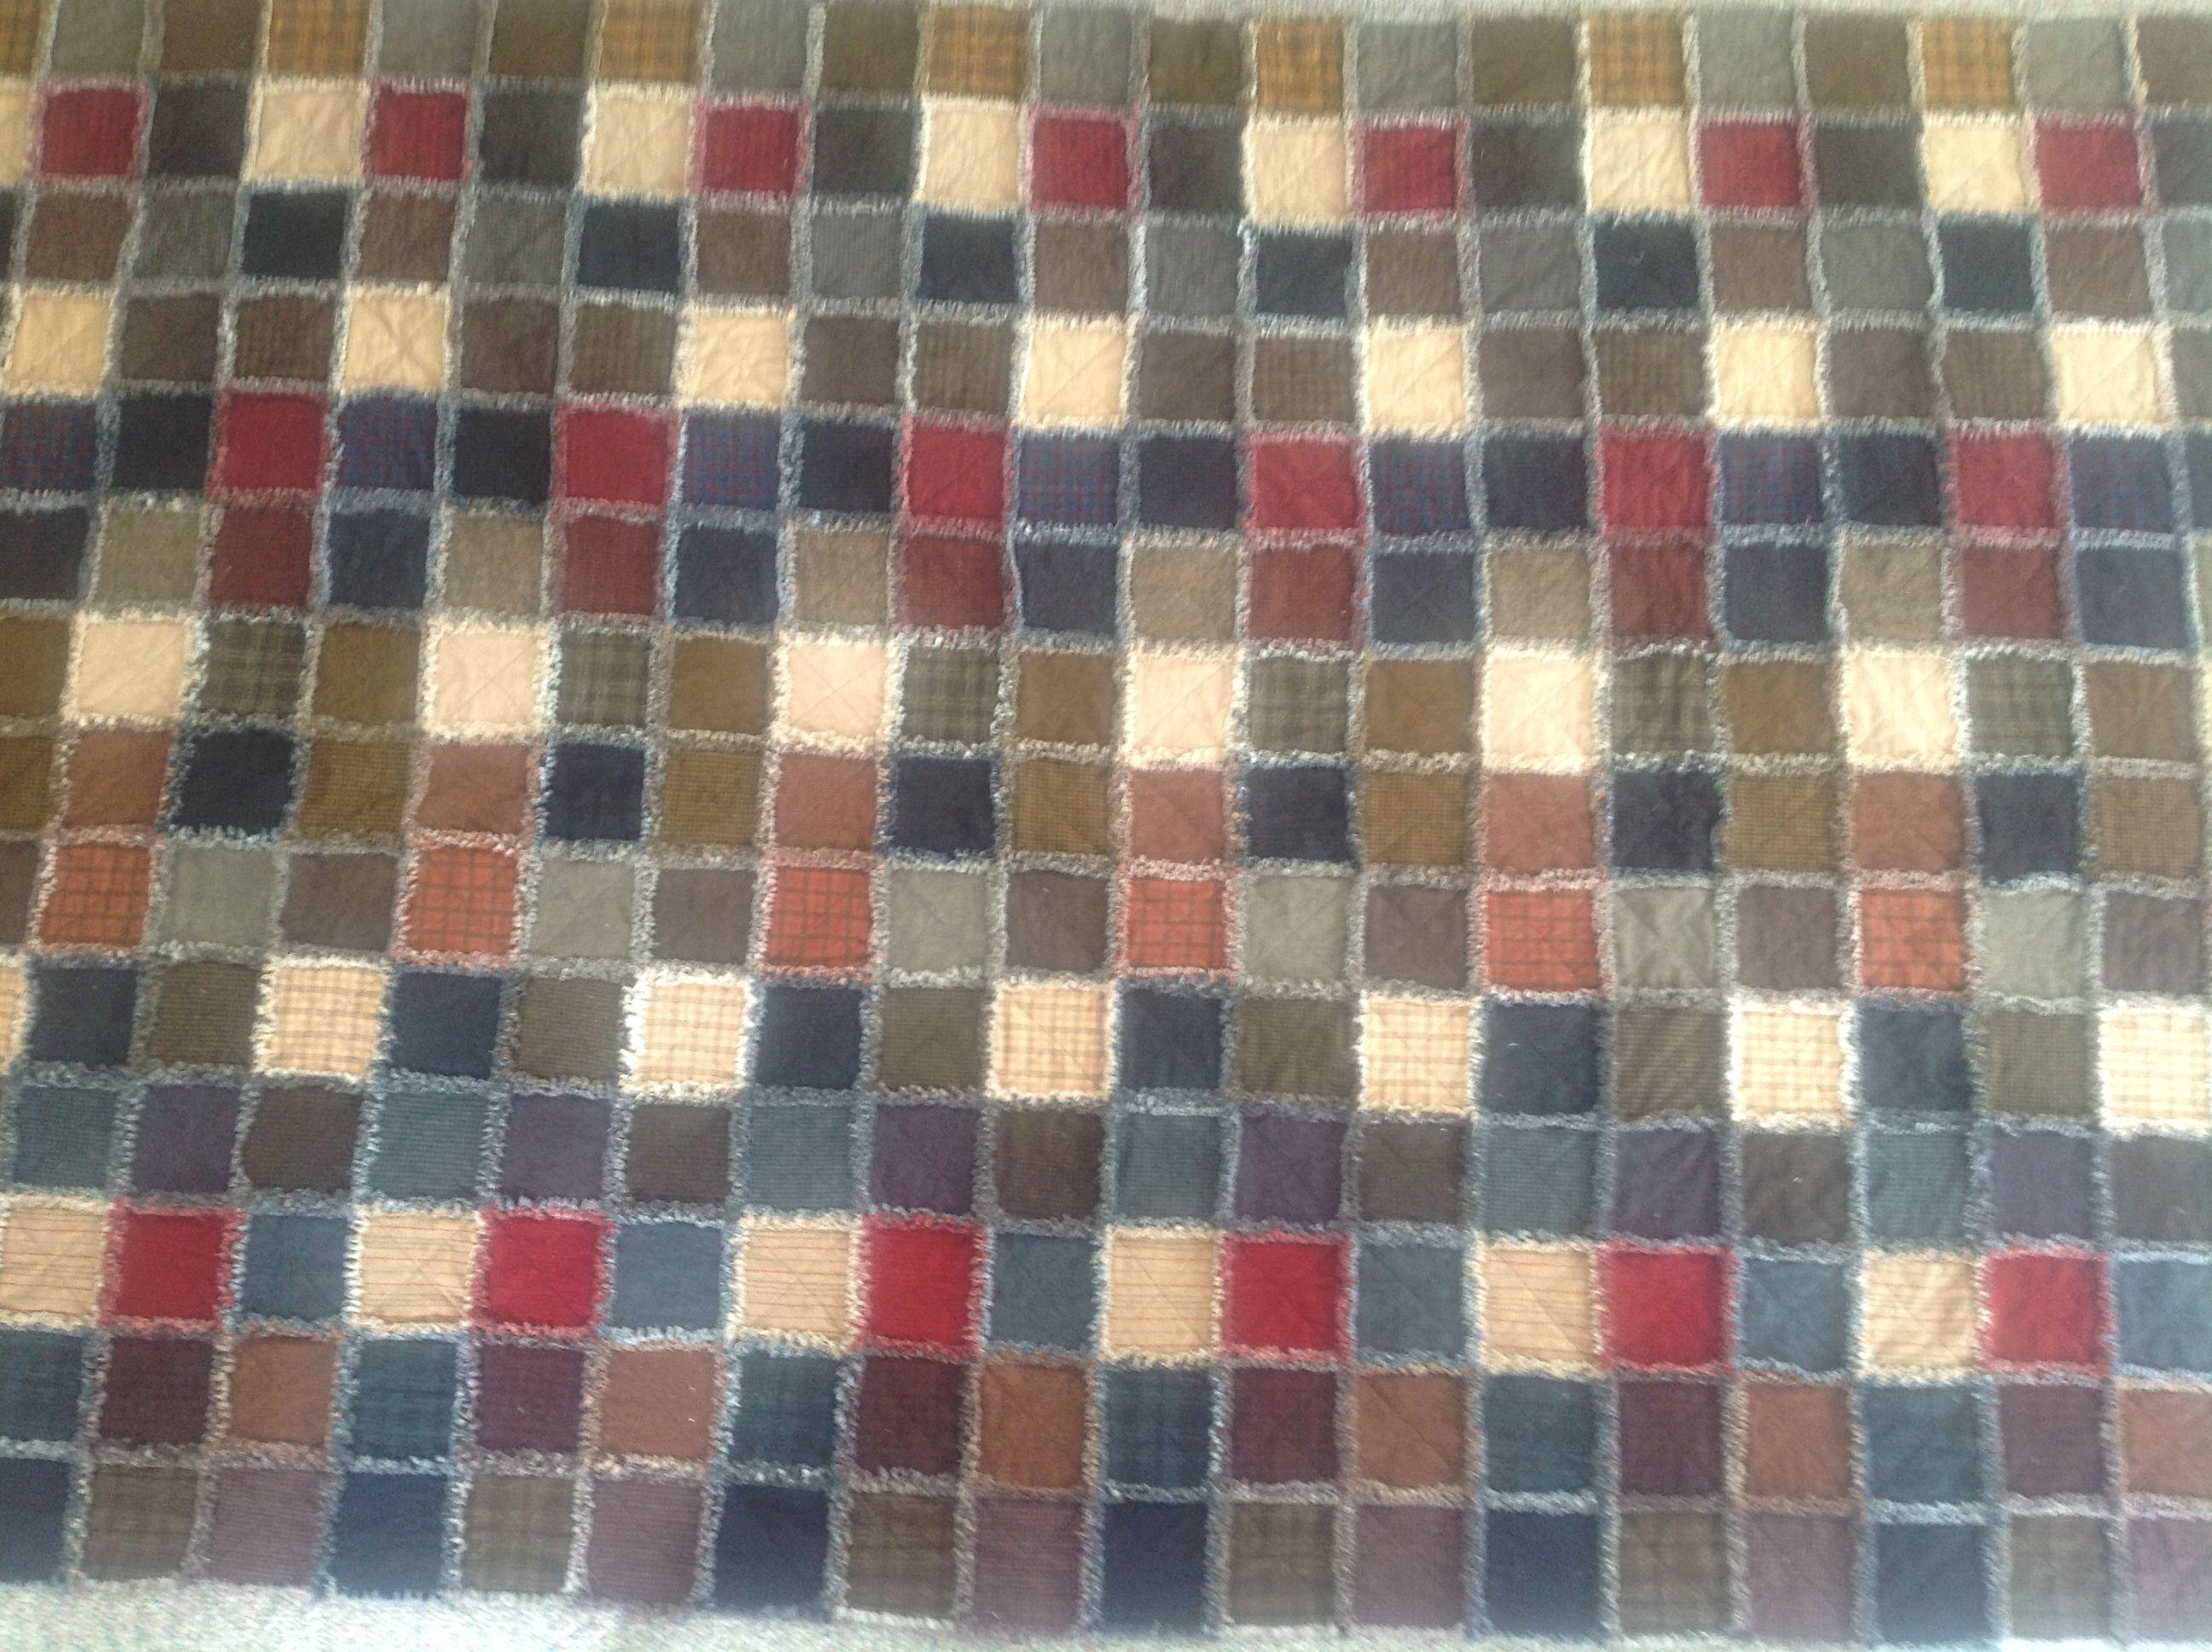 Rag Quilt Color Ideas : Flannel rag quilt. Lots of